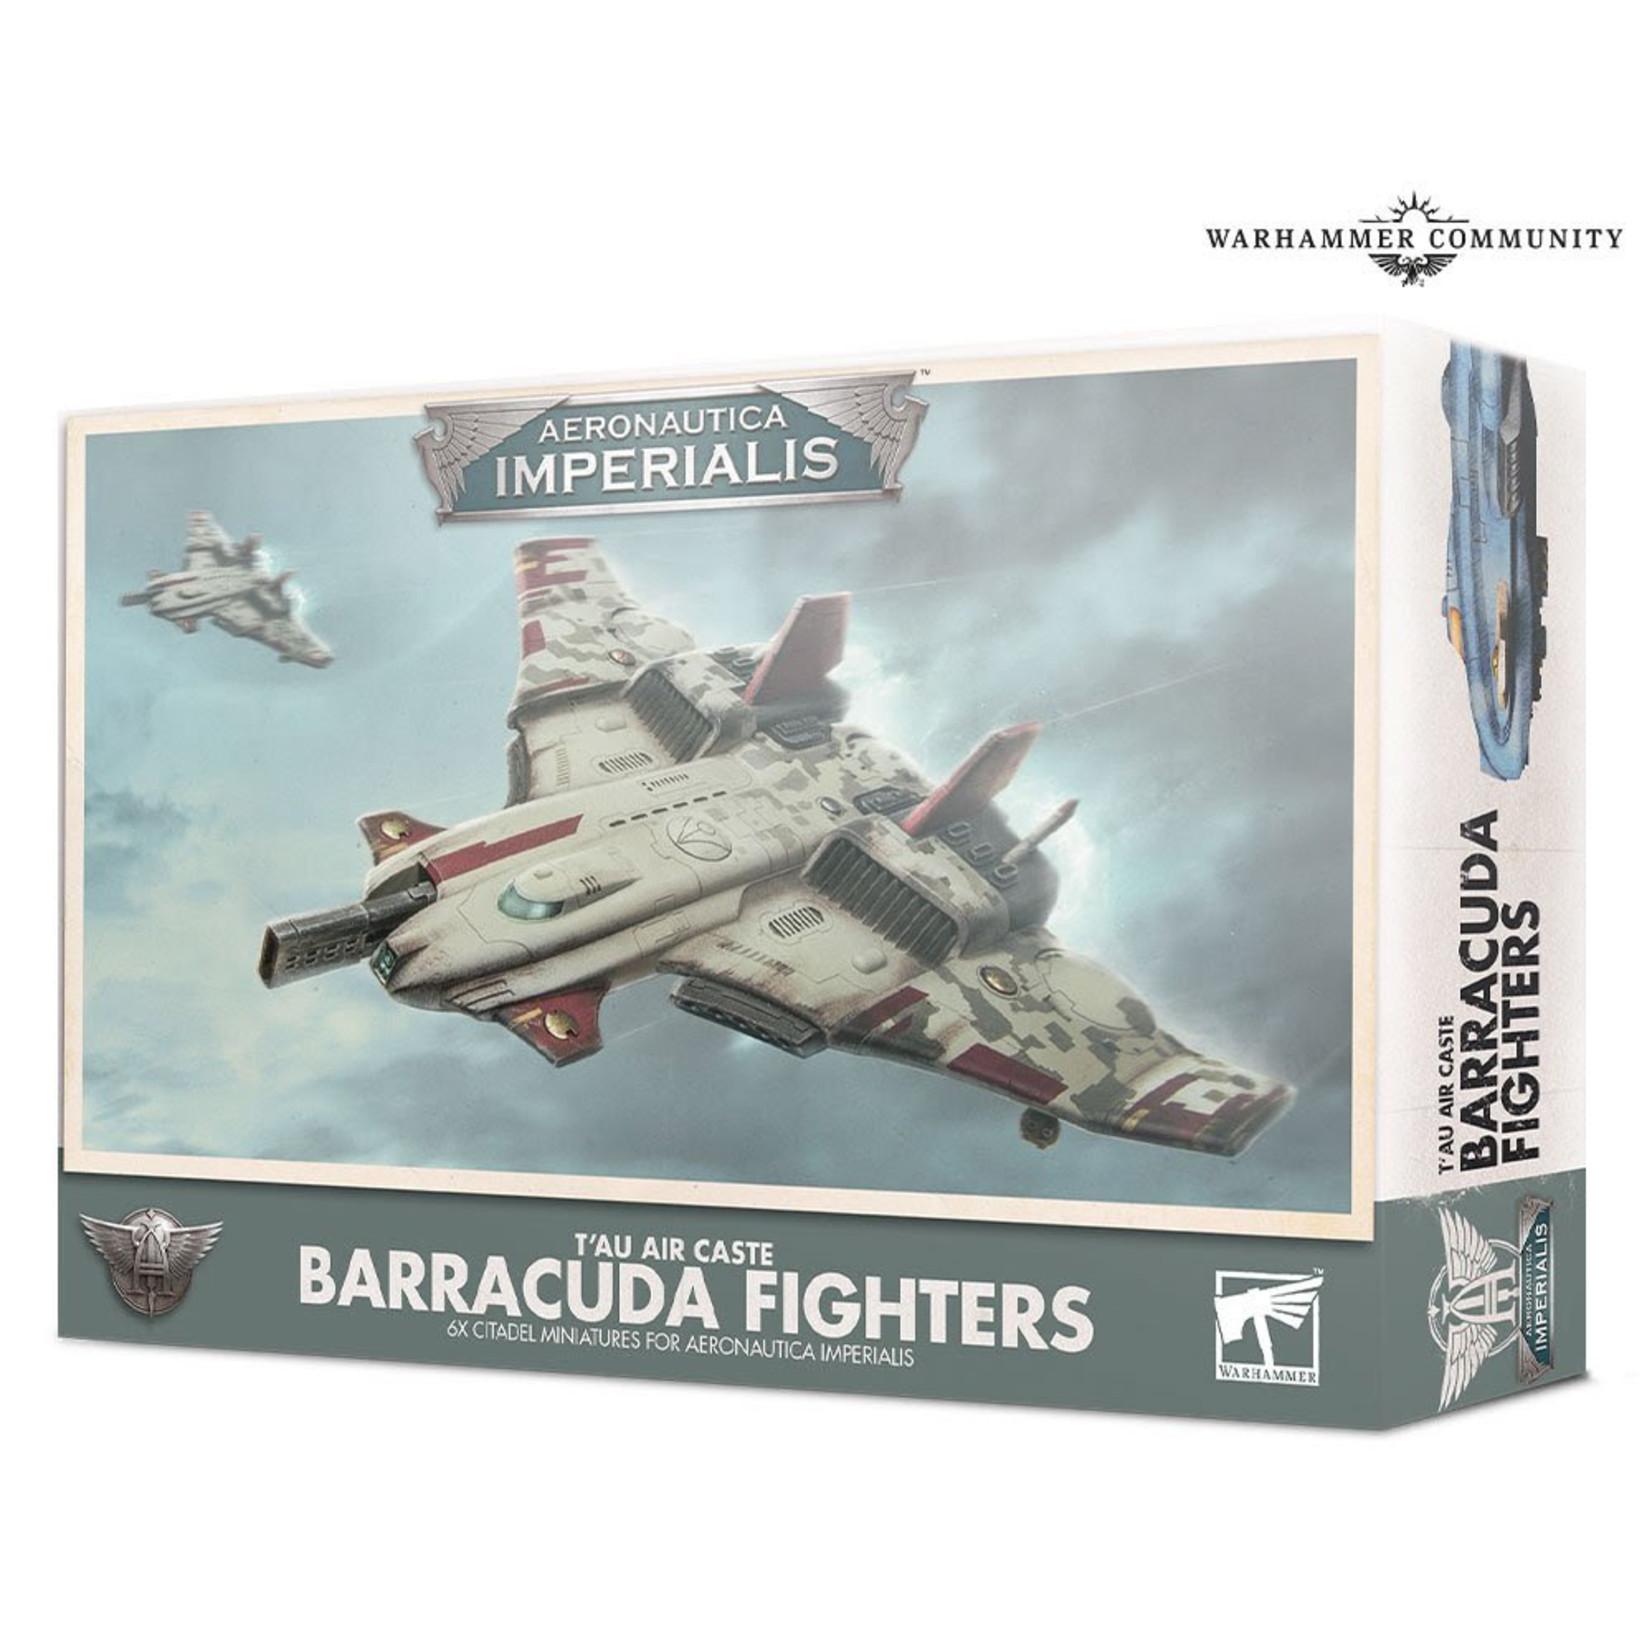 Games Workshop Aeronautica Imperialis T'AU Air Caste Barracuda Fighters